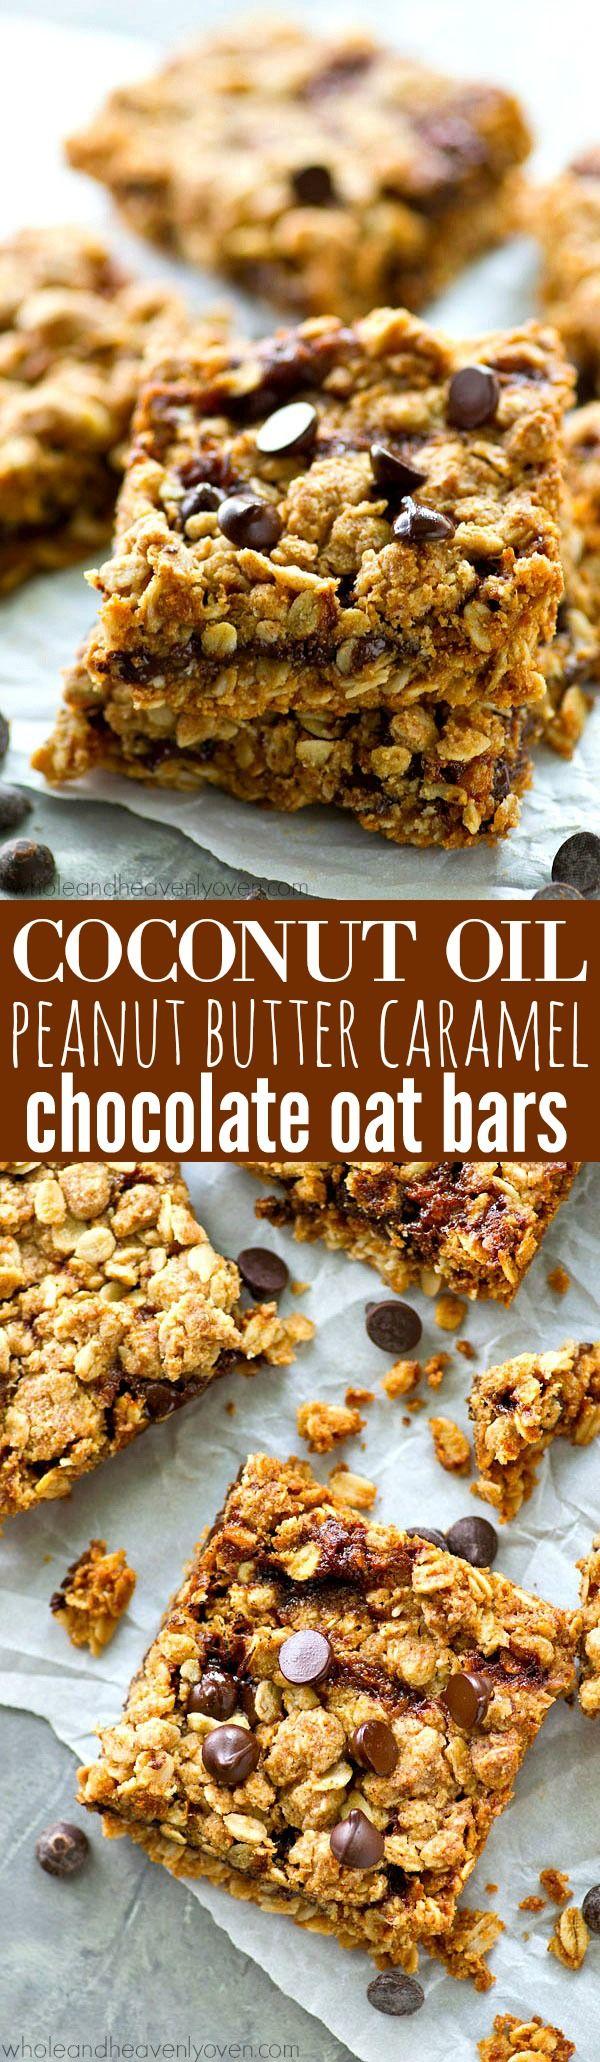 Coconut Oil Peanut Butter Caramel Chocolate Oat Bars